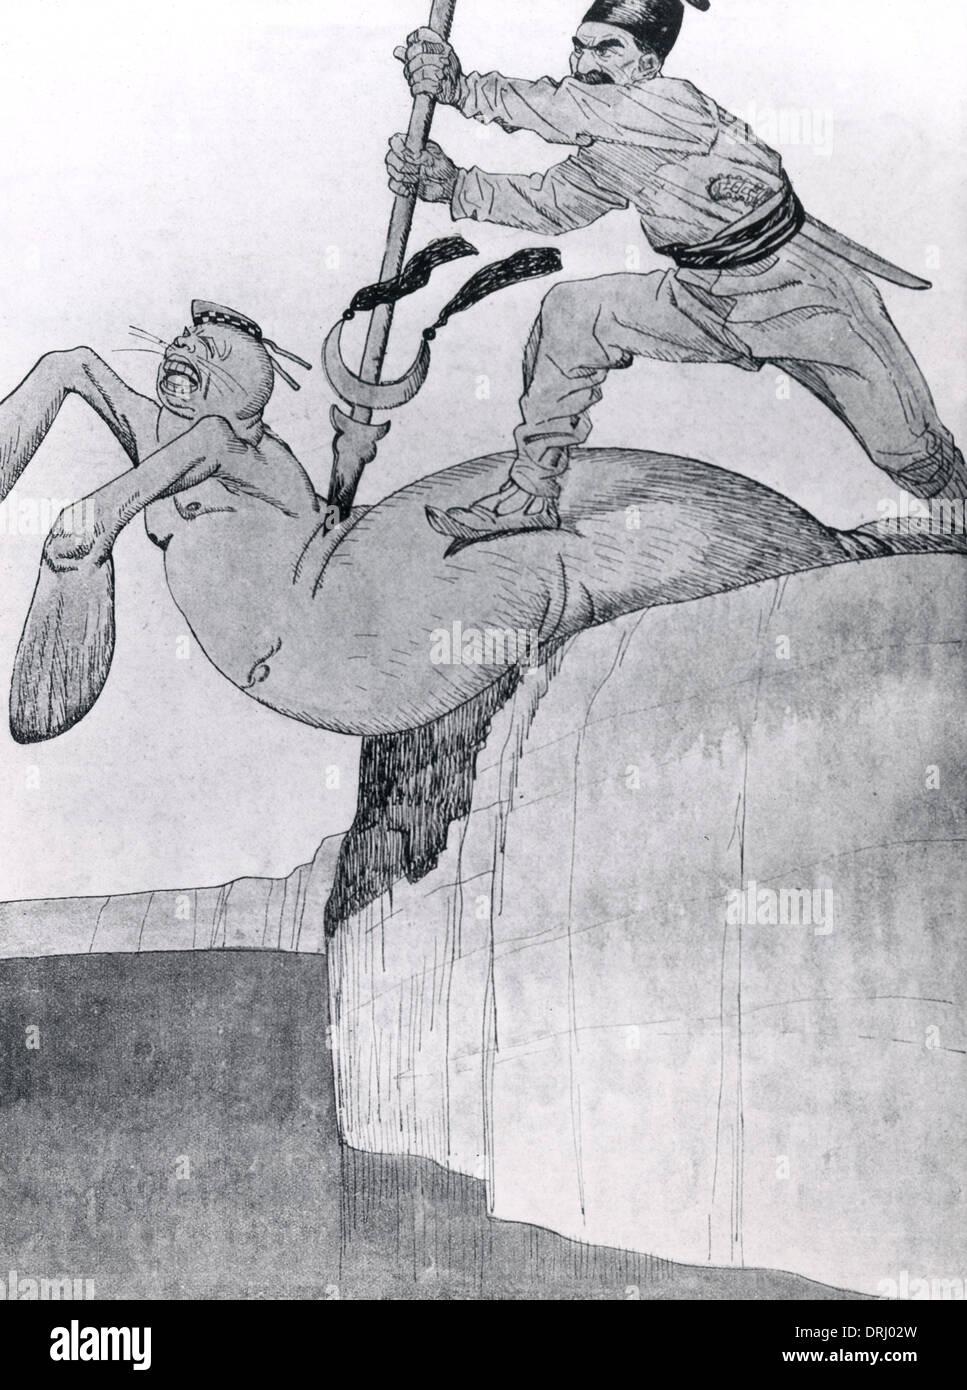 Anti-British cartoon, withdrawal from Gallipoli, WW1 - Stock Image